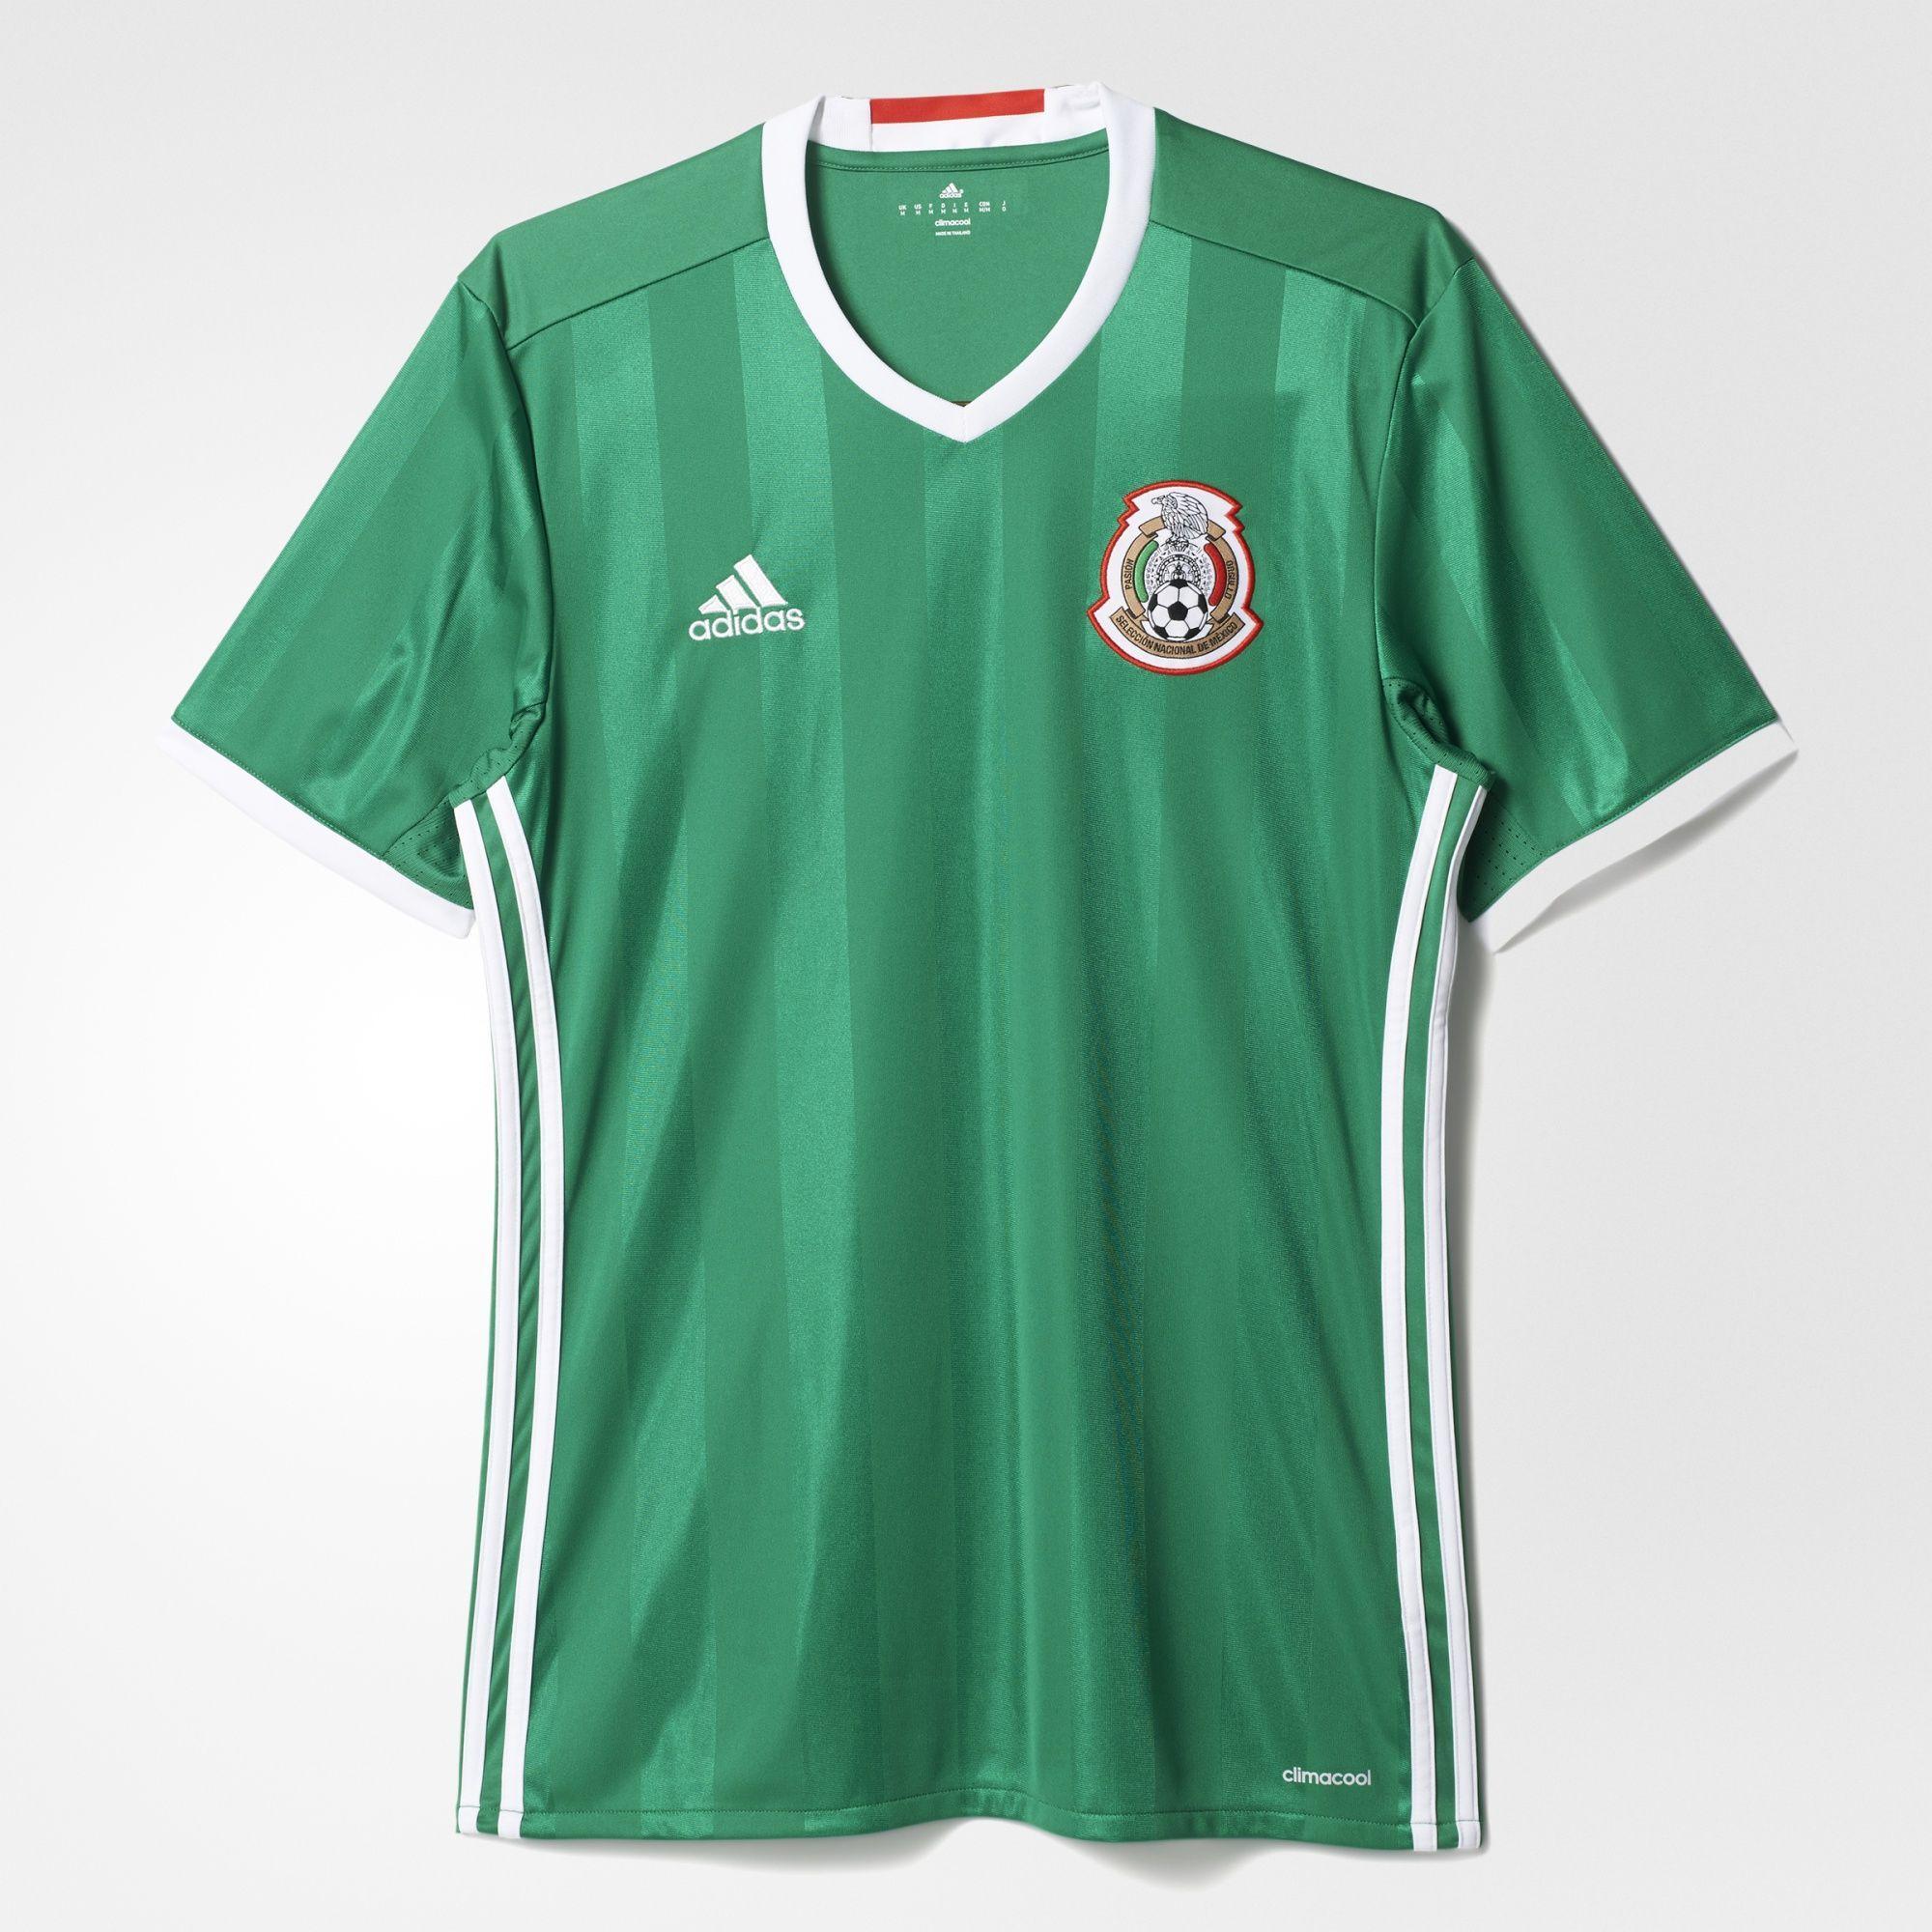 adidas - CAMISETA DE LA SELECCIÓN DE MÉXICO  cd6b21dfa0148